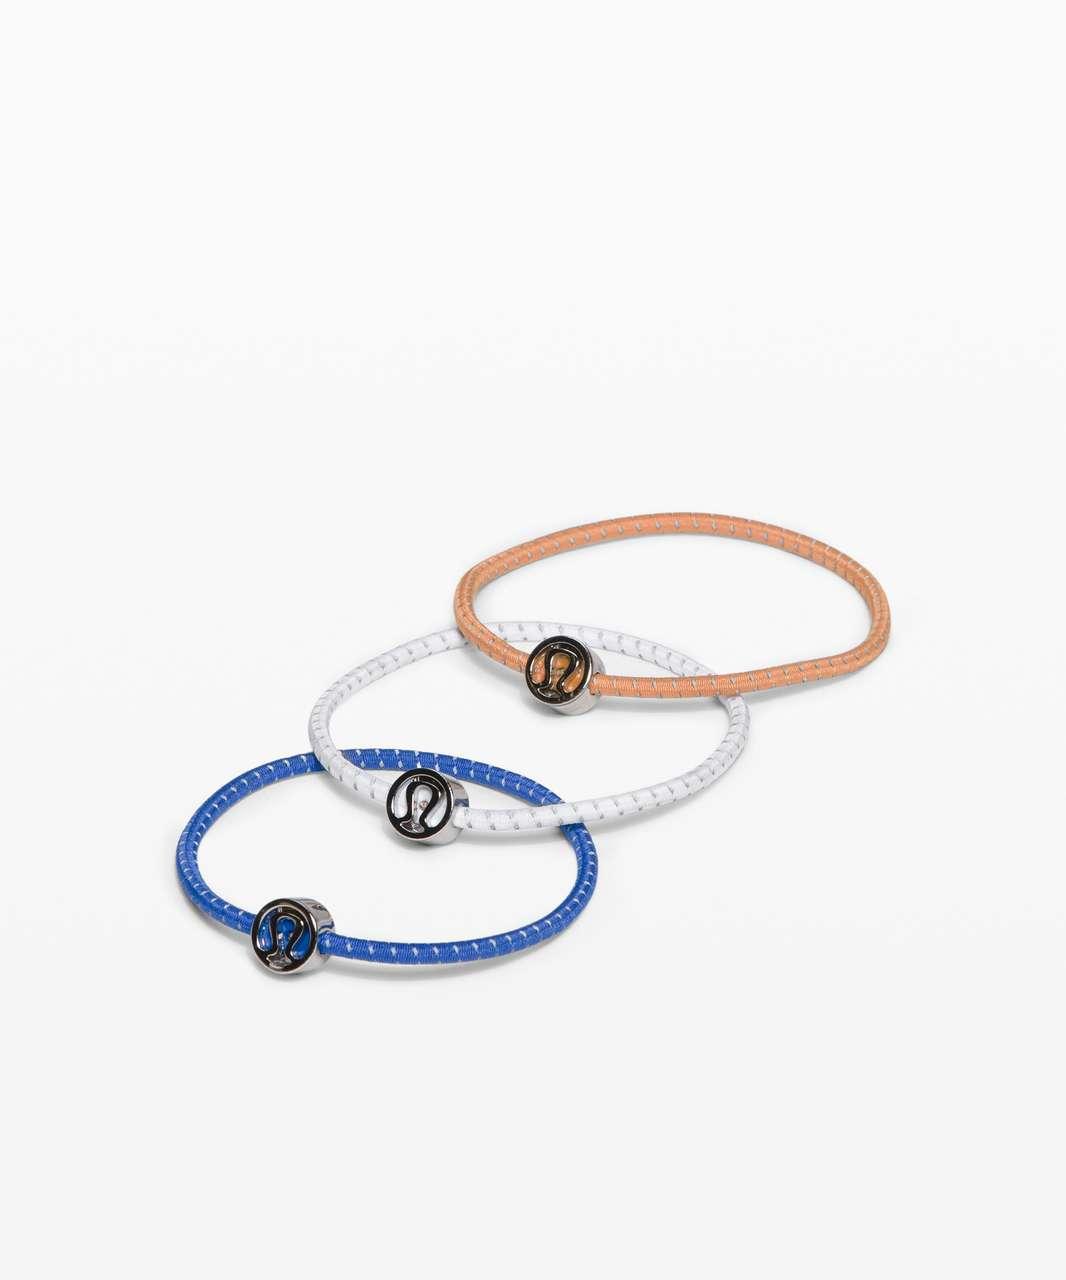 Lululemon Glow On Hair Ties - White / Wild Bluebell / Monarch Orange